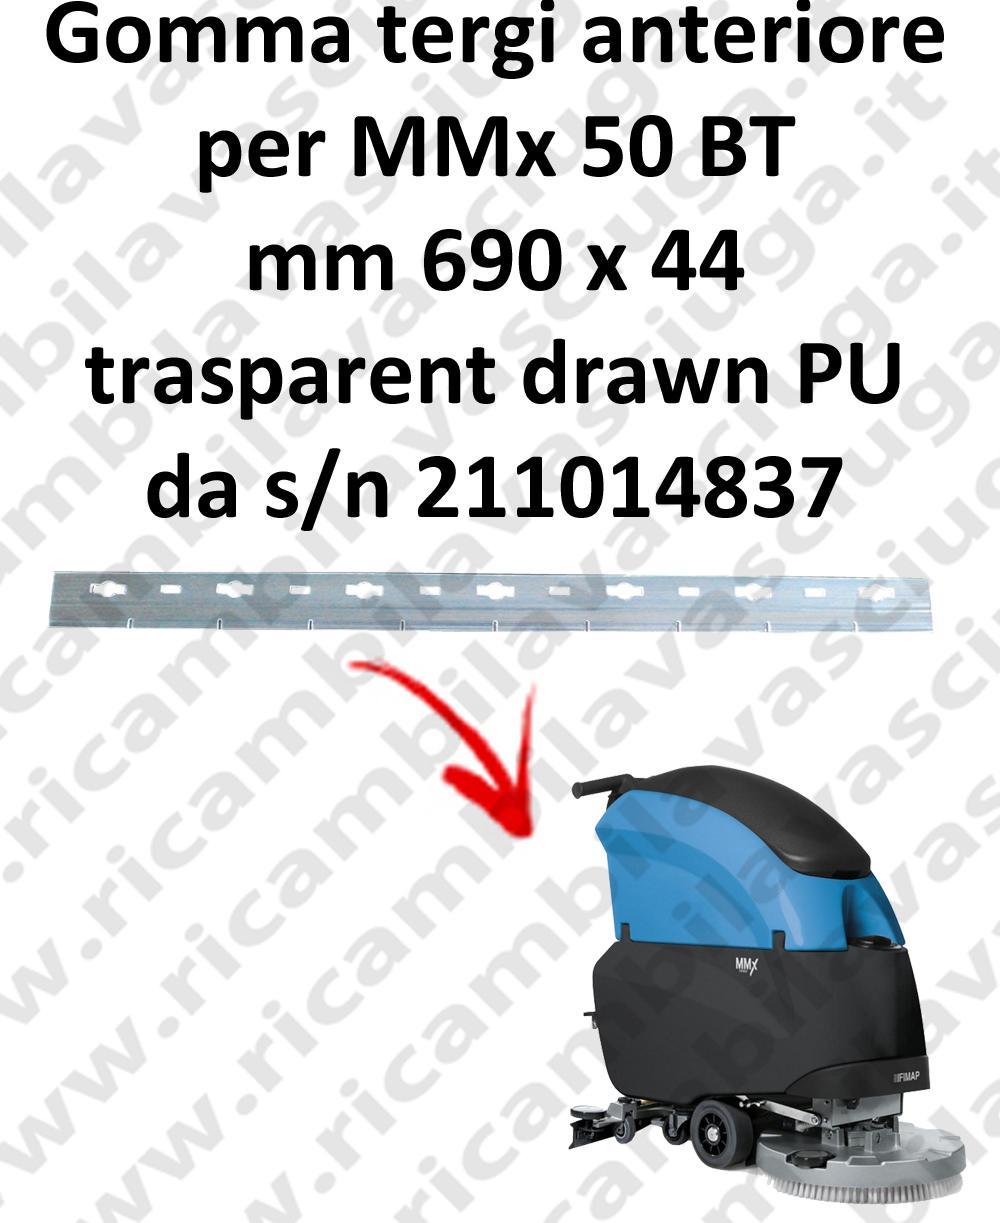 MMx 50 BT da s/n 211014837 Gomma tergipavimento anteriore per lavapavimenti fimap